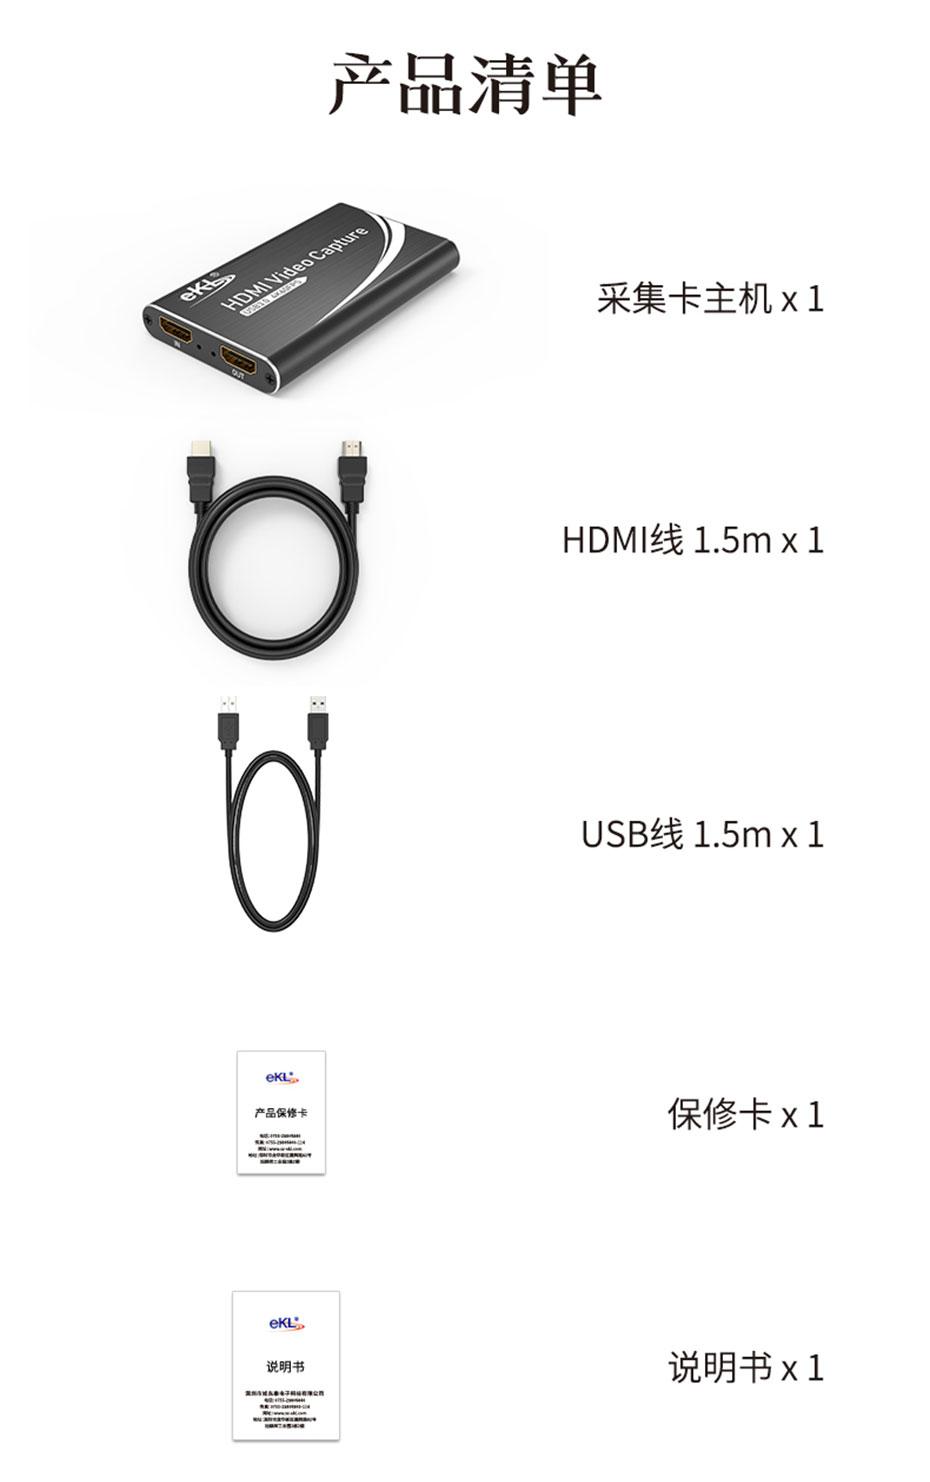 HDMI采集卡/USB视频采集卡HUC03标准配件